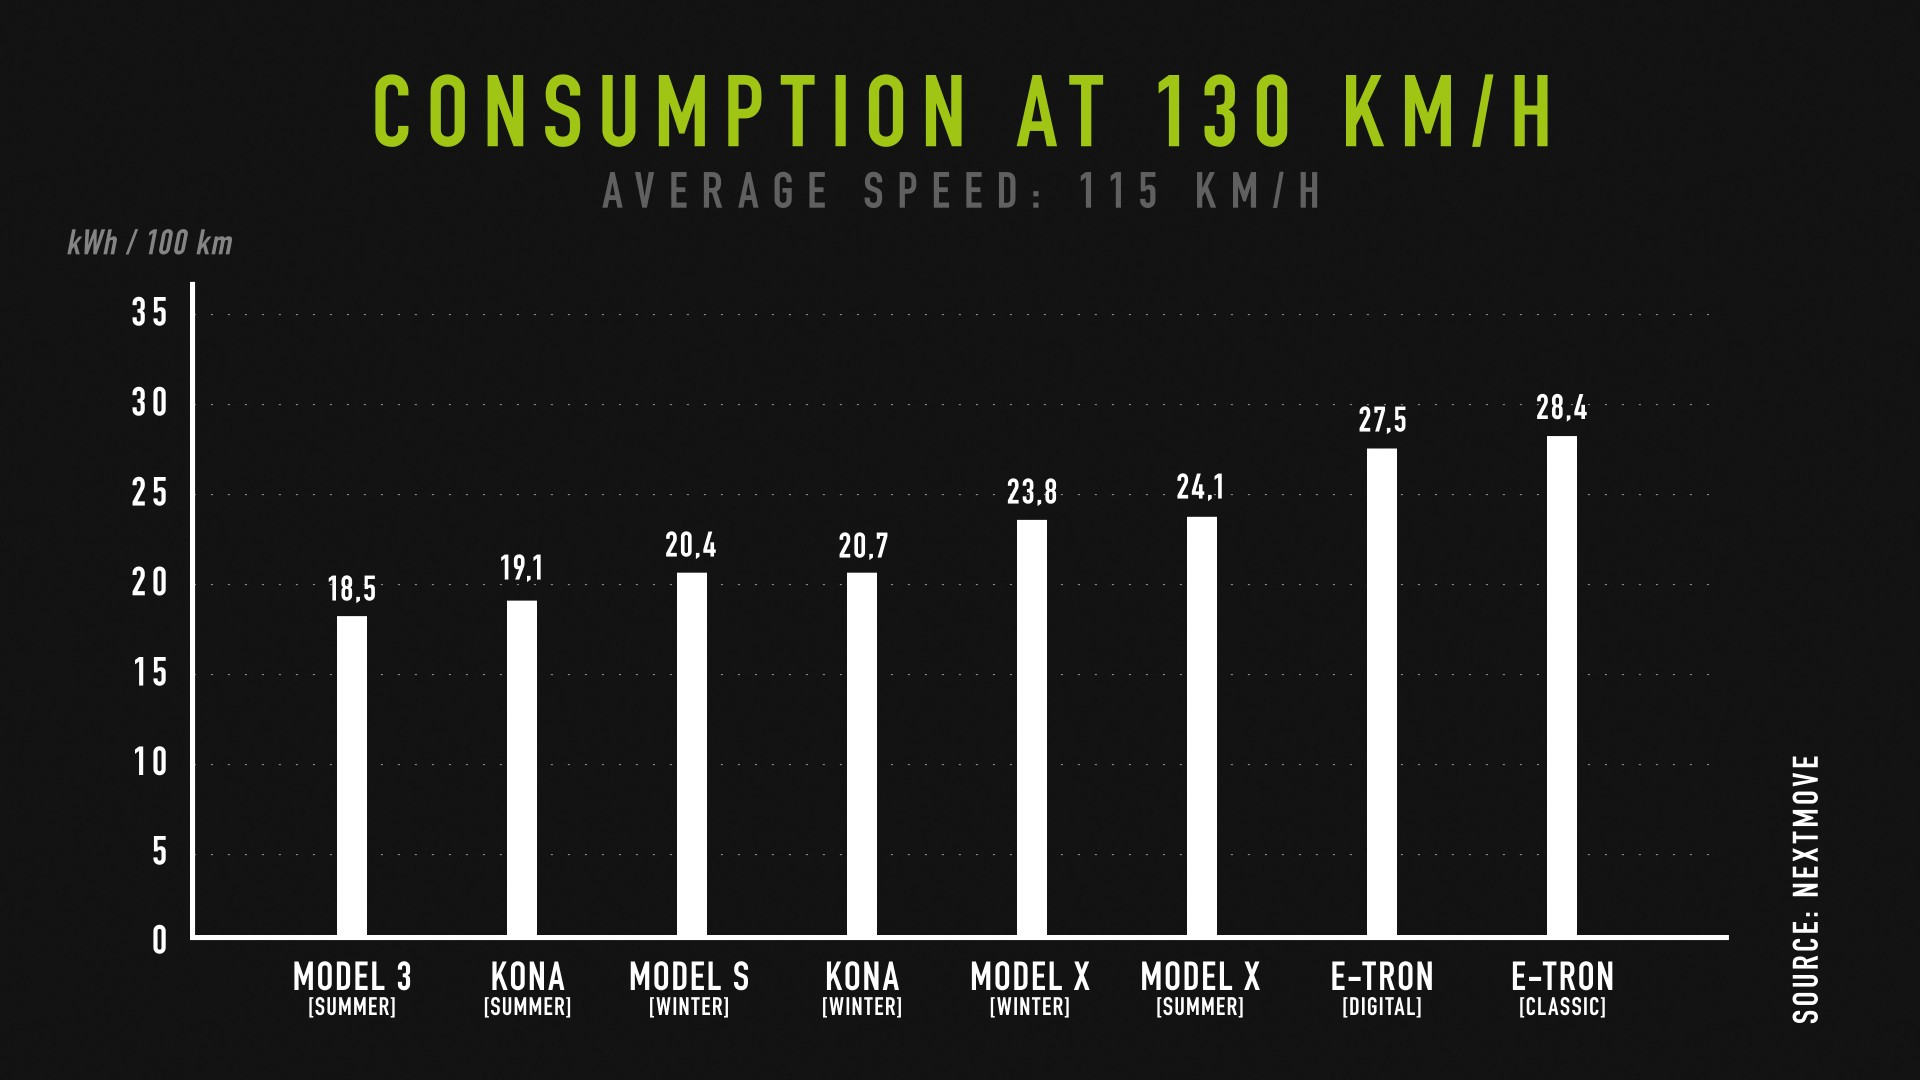 nextmove-Verbrauchstest-consumption-at-130-kph